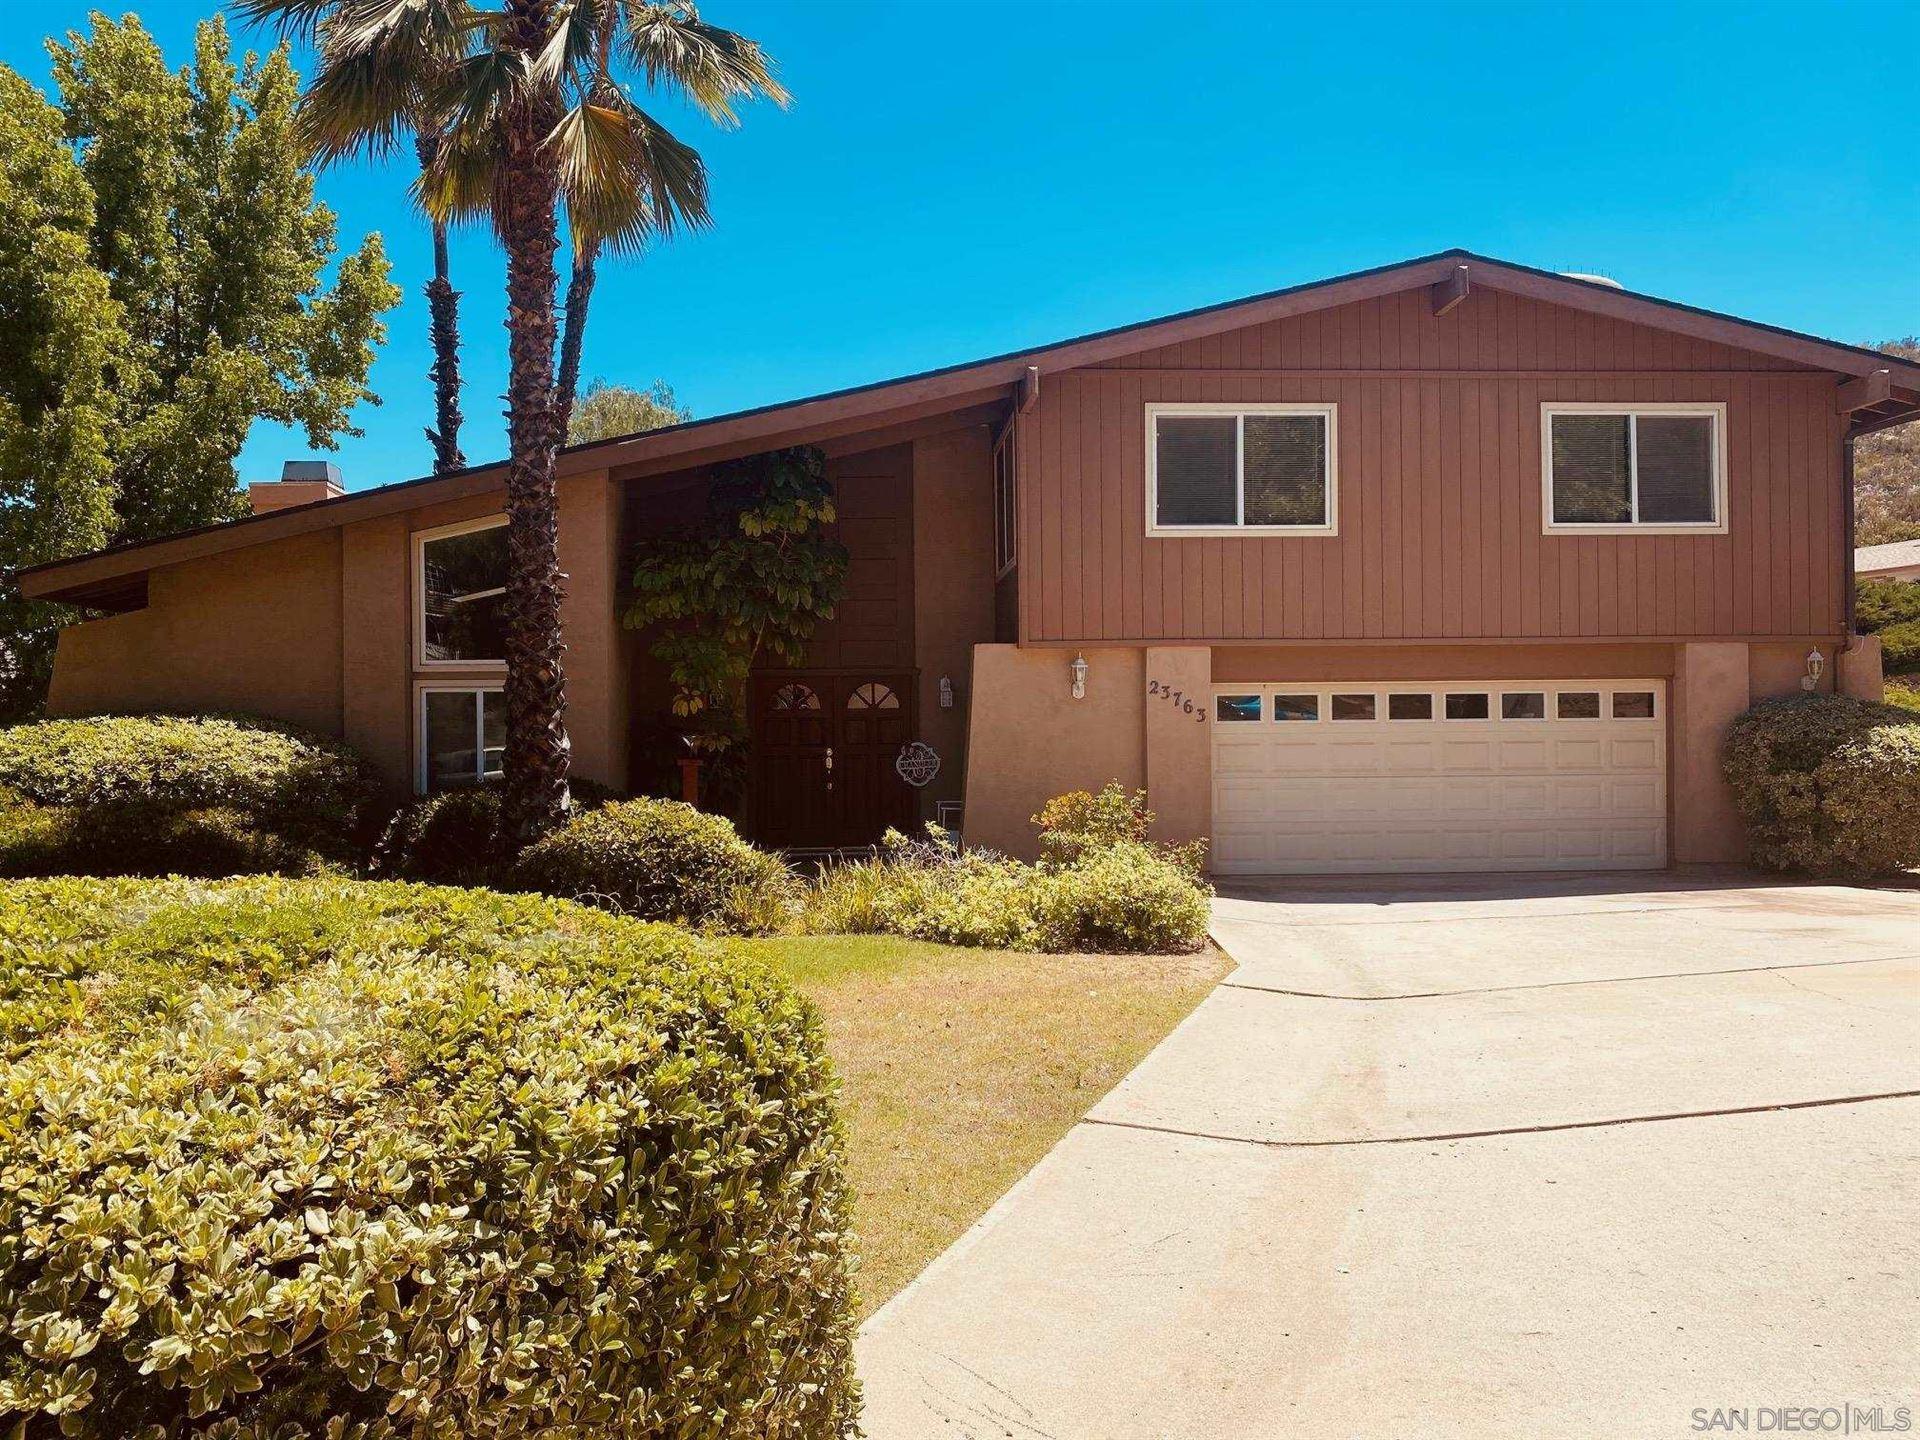 Photo of 23763 Vista Ramona Rd, Ramona, CA 92065 (MLS # 210016168)